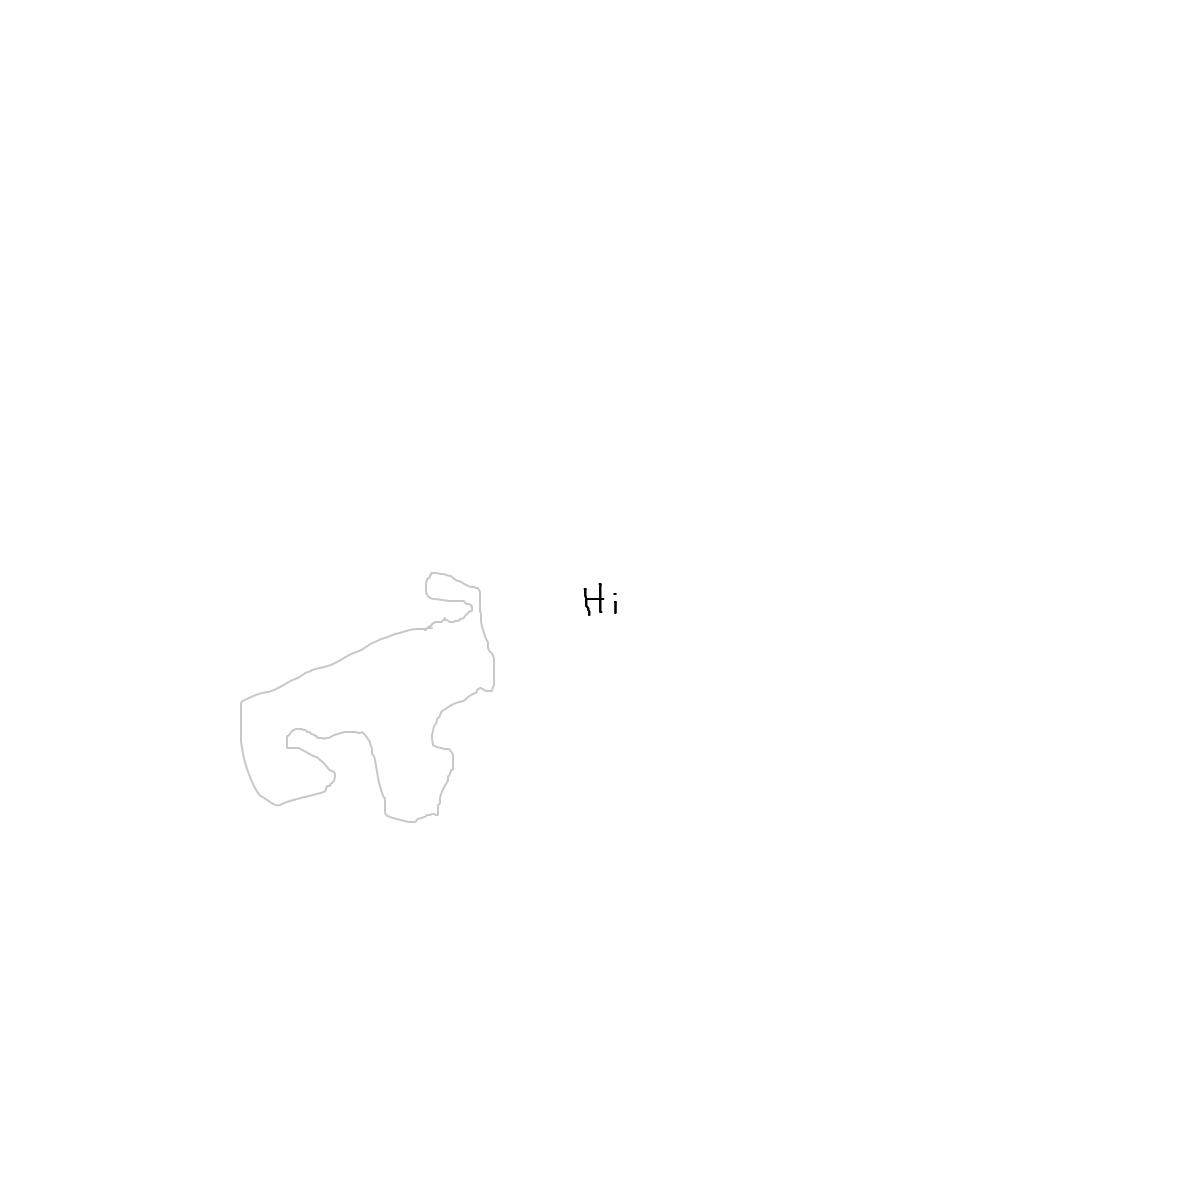 BAAAM drawing#12283 lat:47.0236587524414060lng: -55.5627250671386700